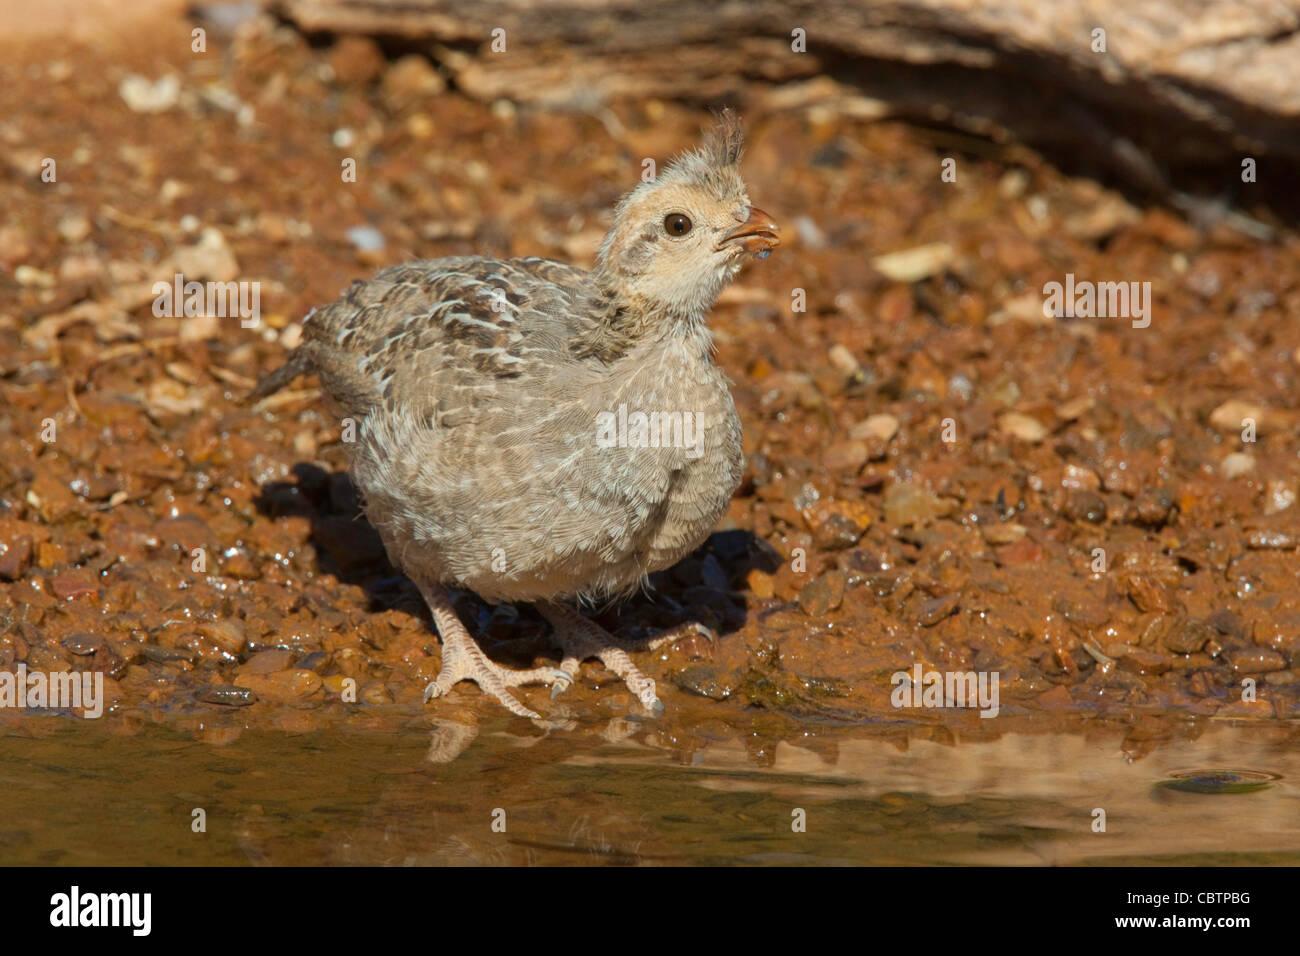 Gambel's Quail Callipepla gambelii Amado, Santa Cruz County, Arizona, United States 3 June Immature Phasianidae - Stock Image